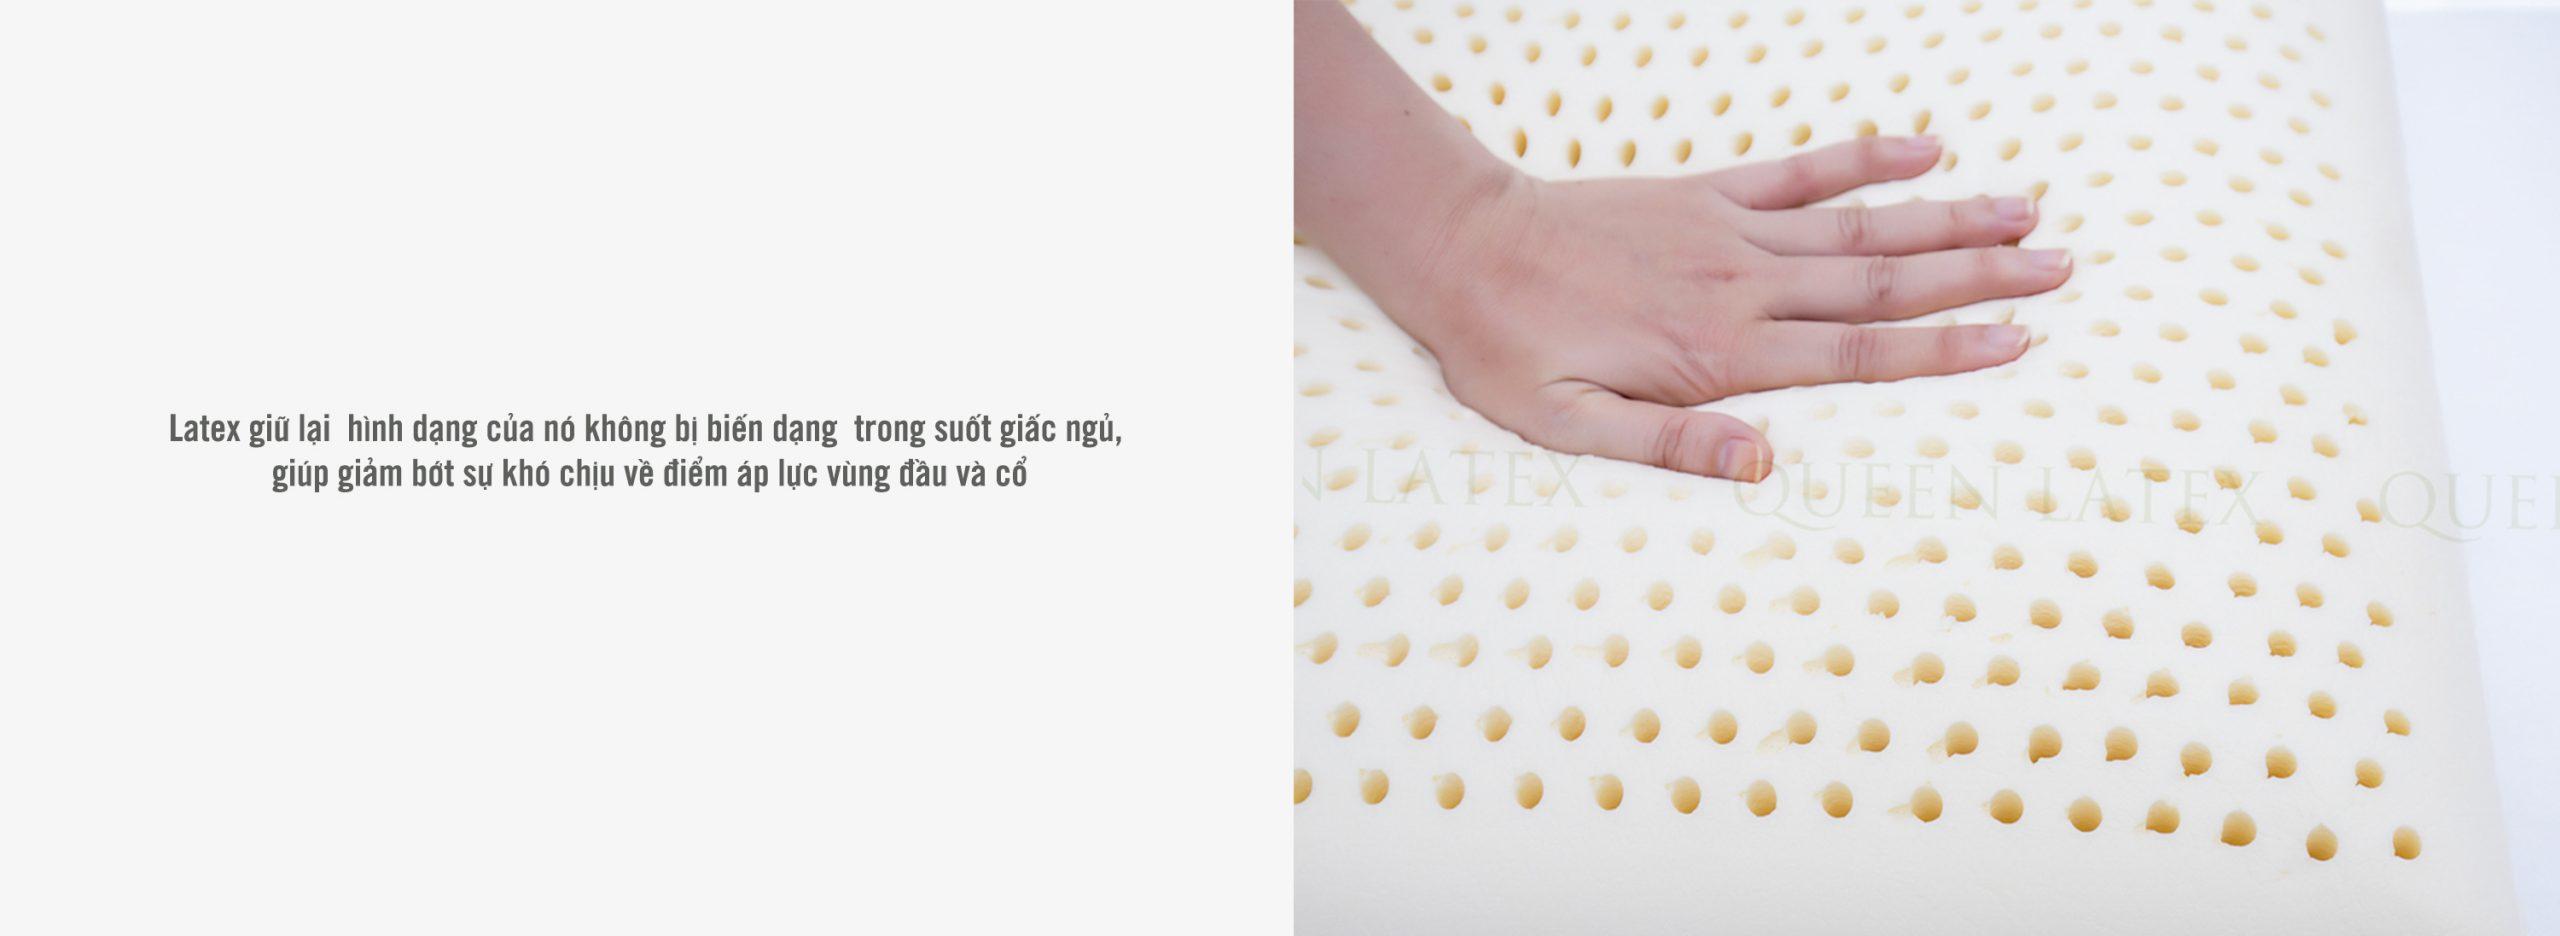 Gối cao su massage G/G2 - Vạn Thành goi cao su thien nhien 5 scaled